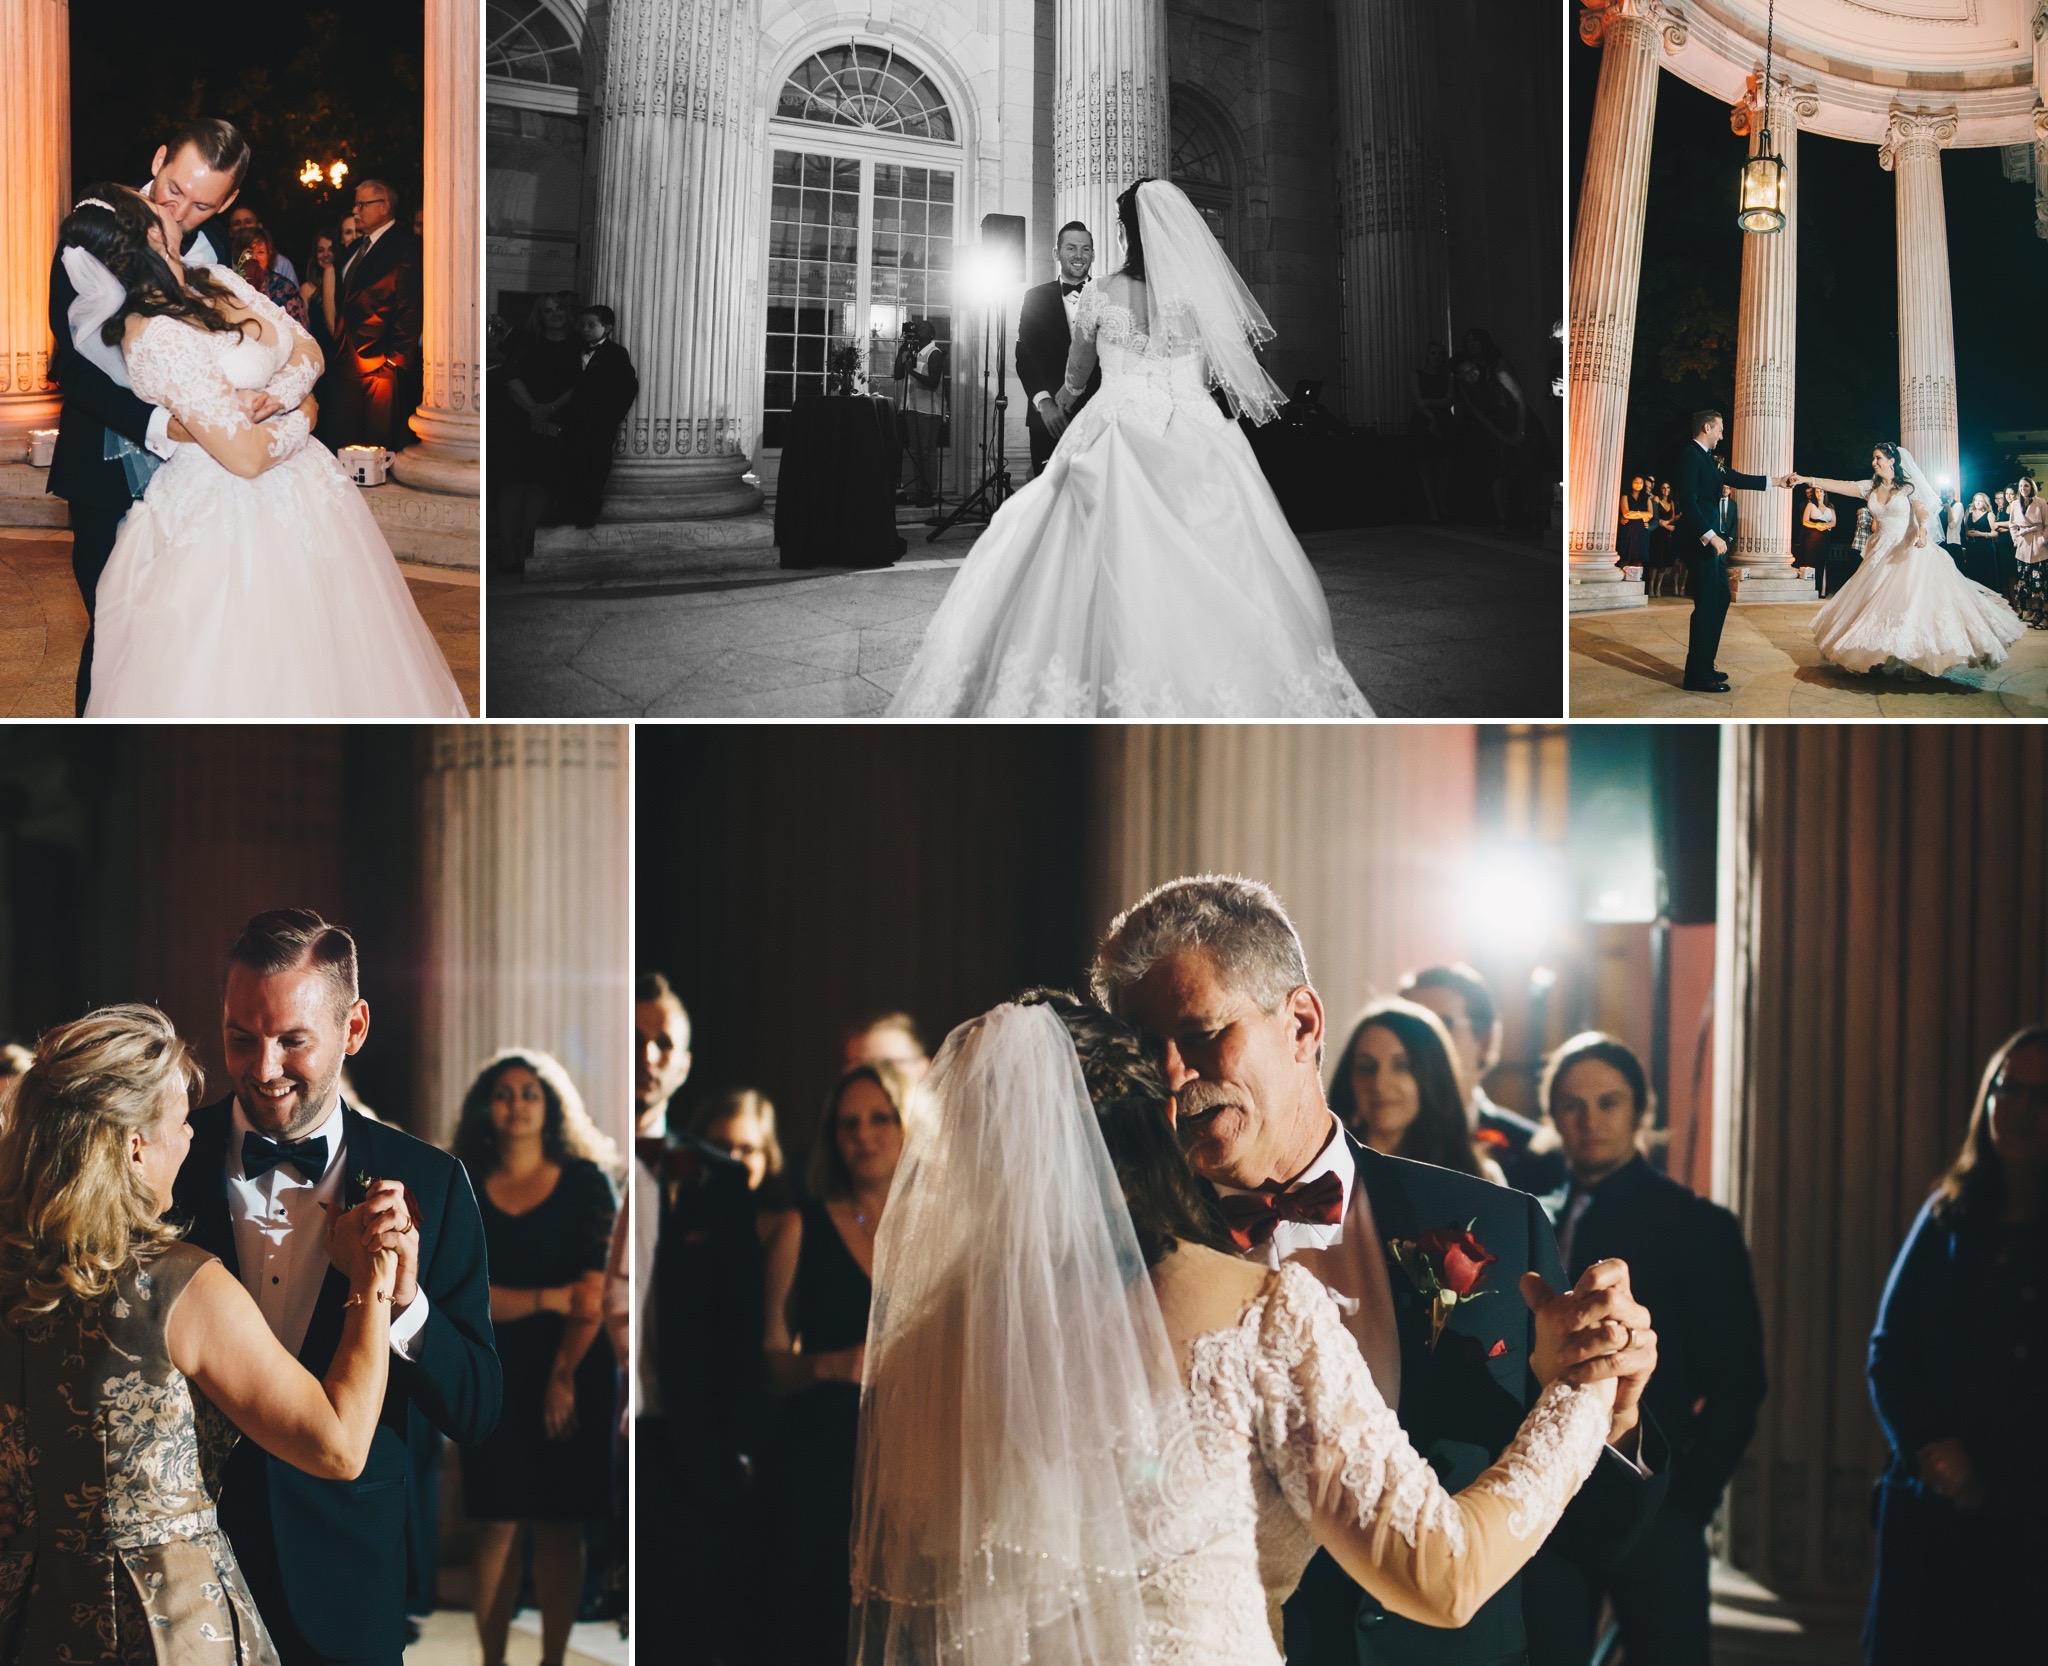 Nathan Elaina Romantic Capitol Wedding in Washington DC by Jonathan Hannah Photography16.jpg